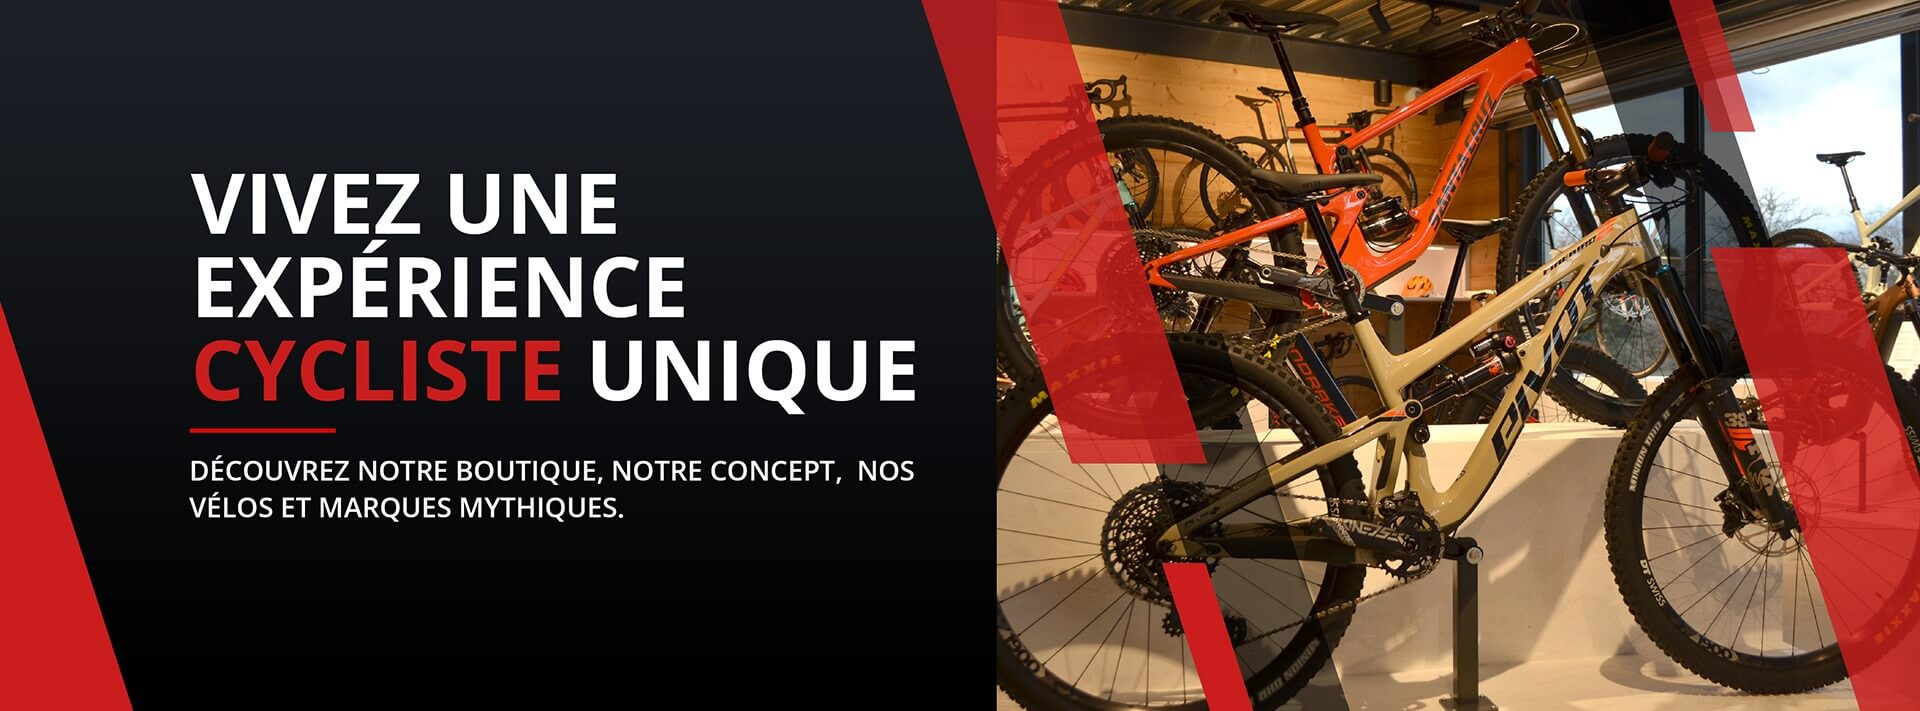 boutique-velos-lyon-villefranche-vtt-course-triathlon-sport